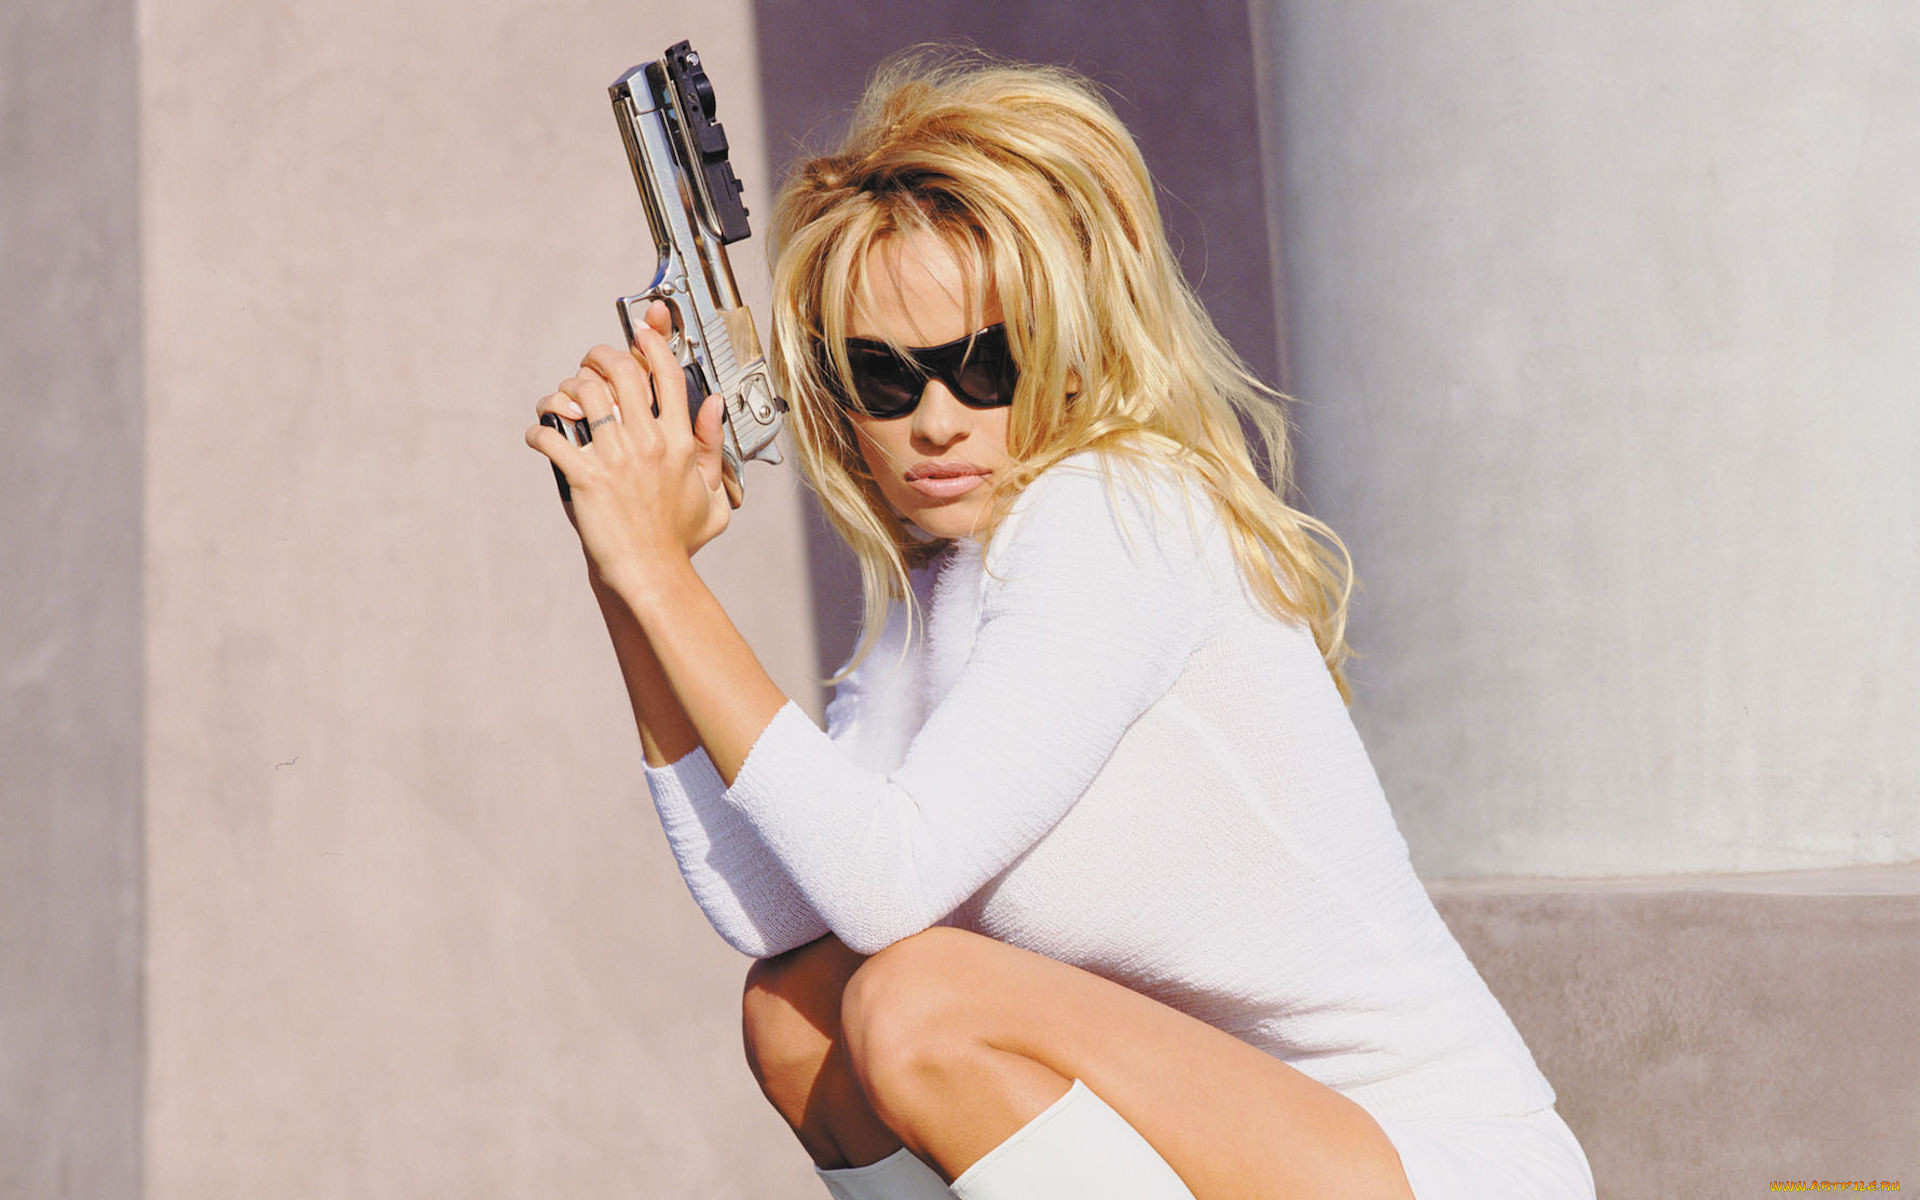 Фото Pamela Anderson - домашнее порно памелы андерсон.